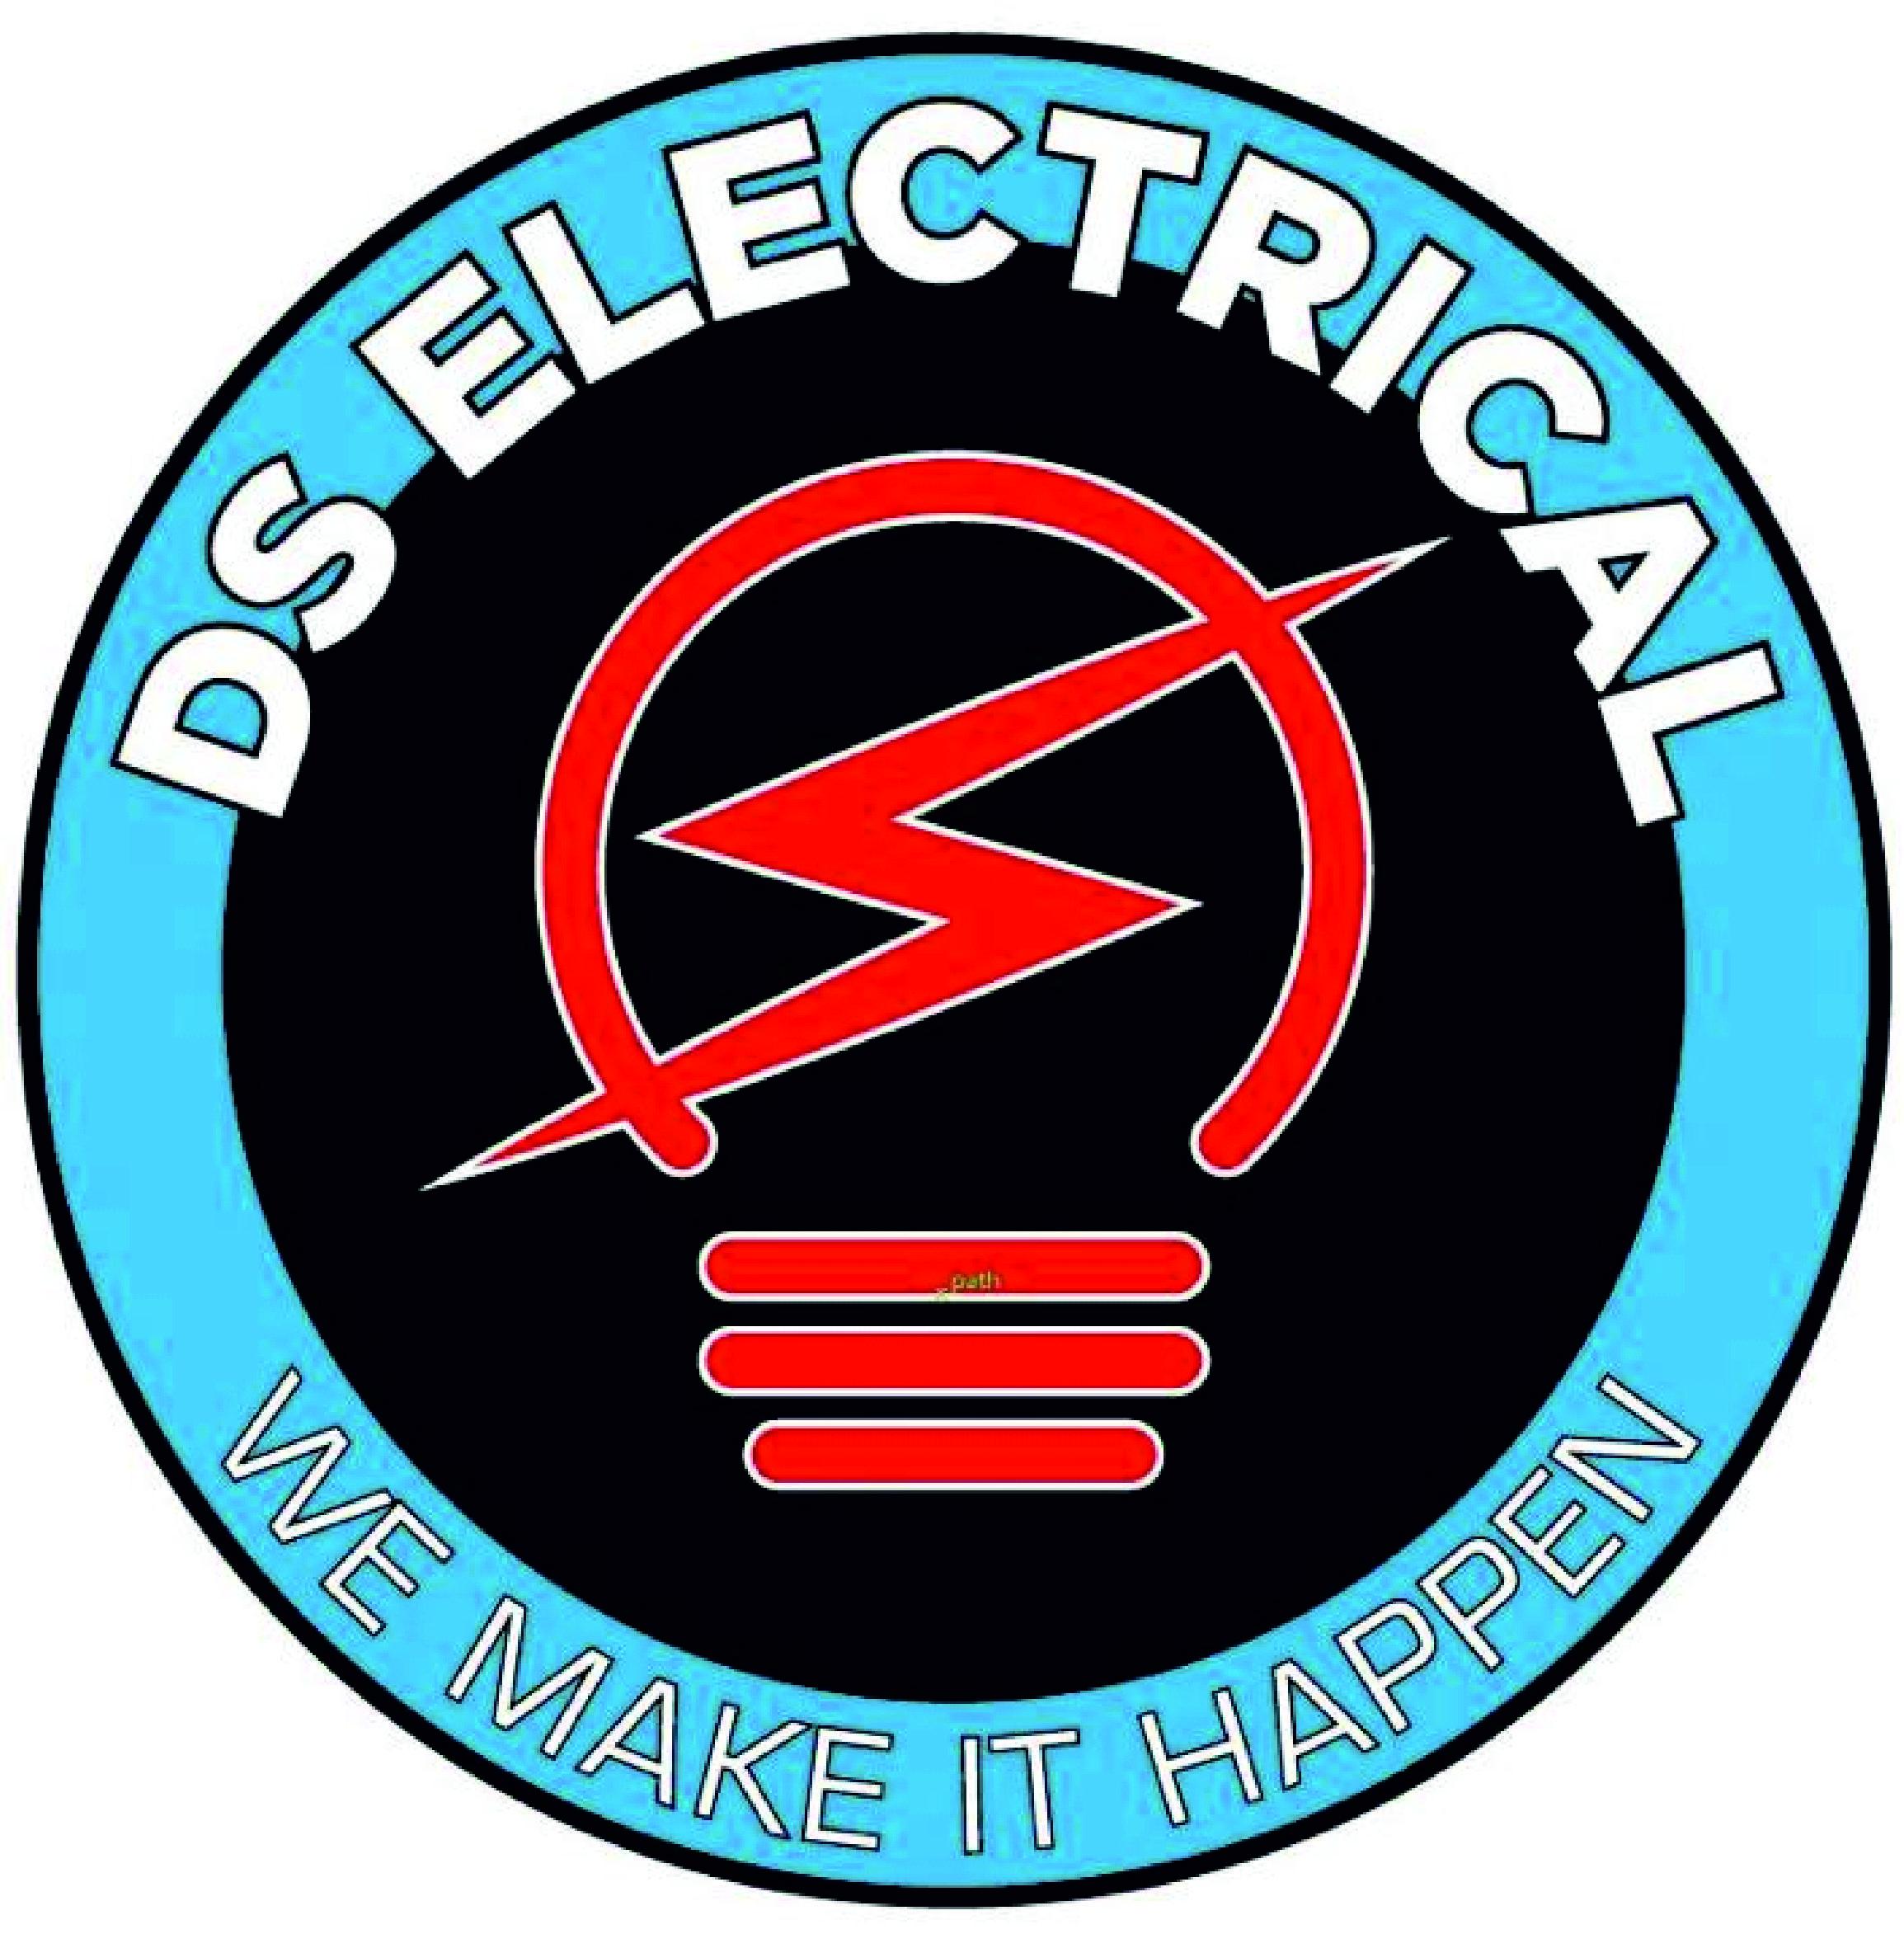 Daniel Swain- D S Electrical